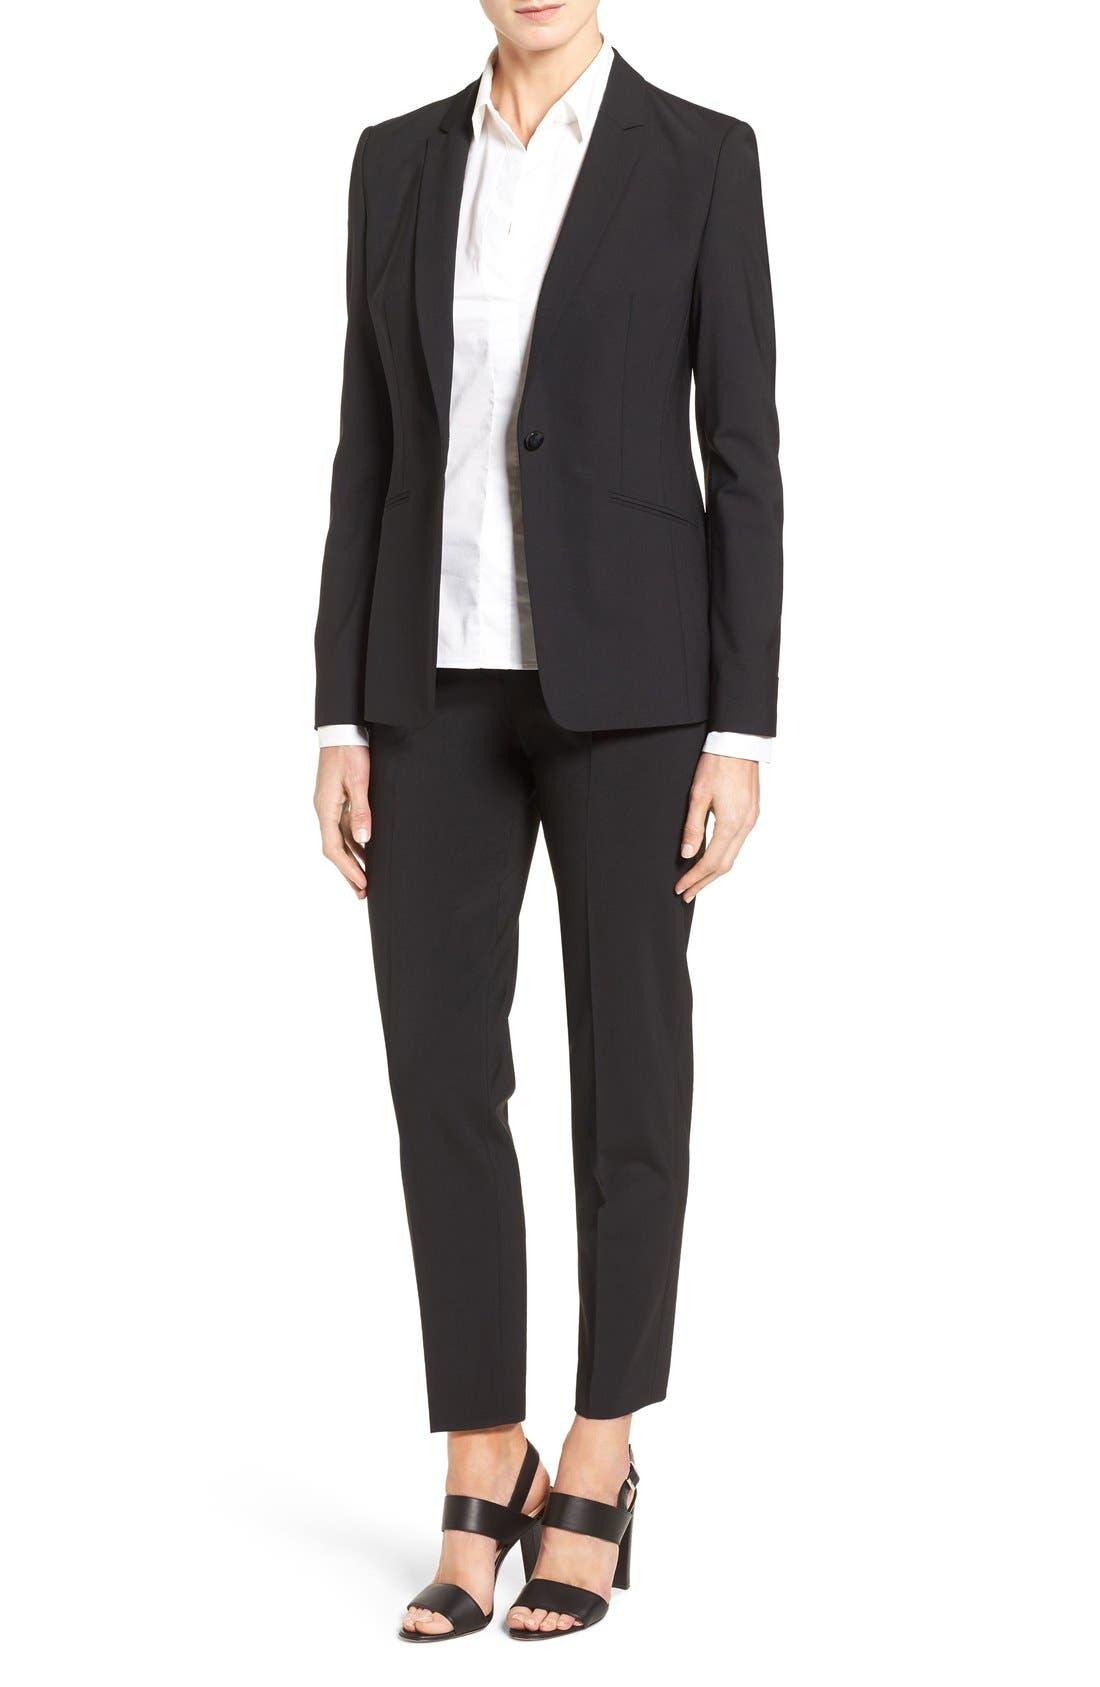 BOSS Suit Jacket, Ankle Trousers & Shirt